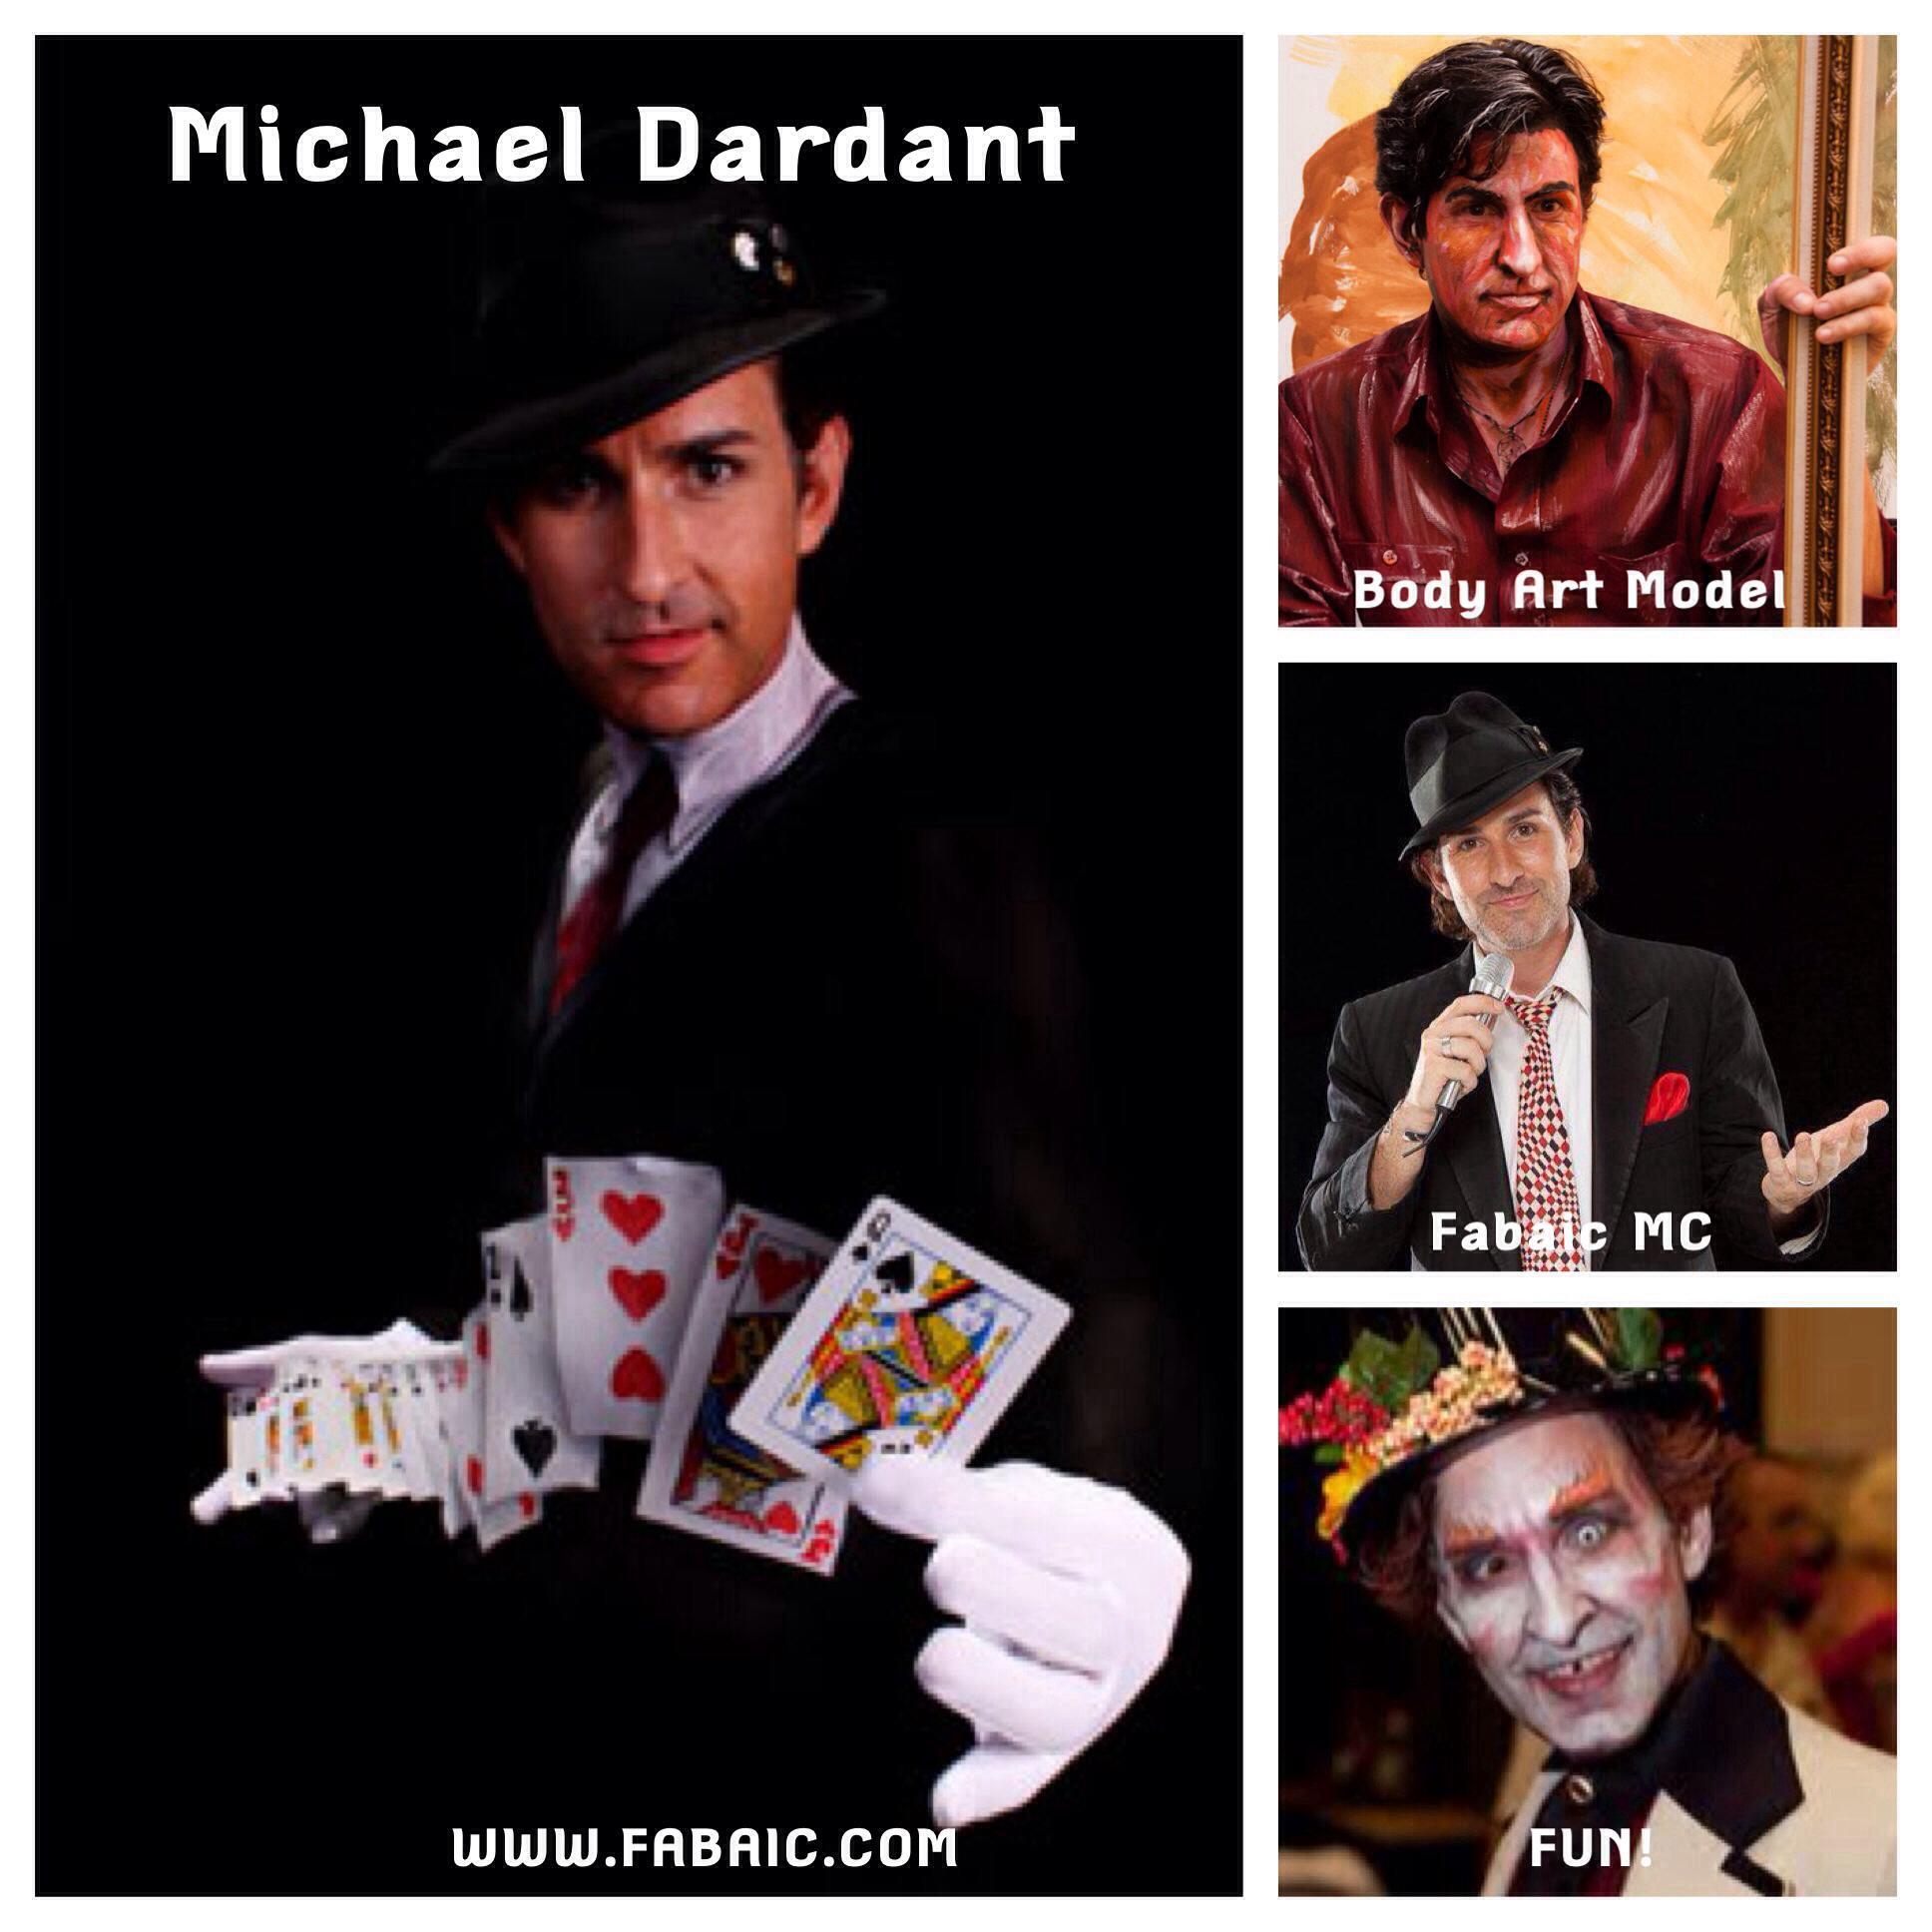 Michael Dardant